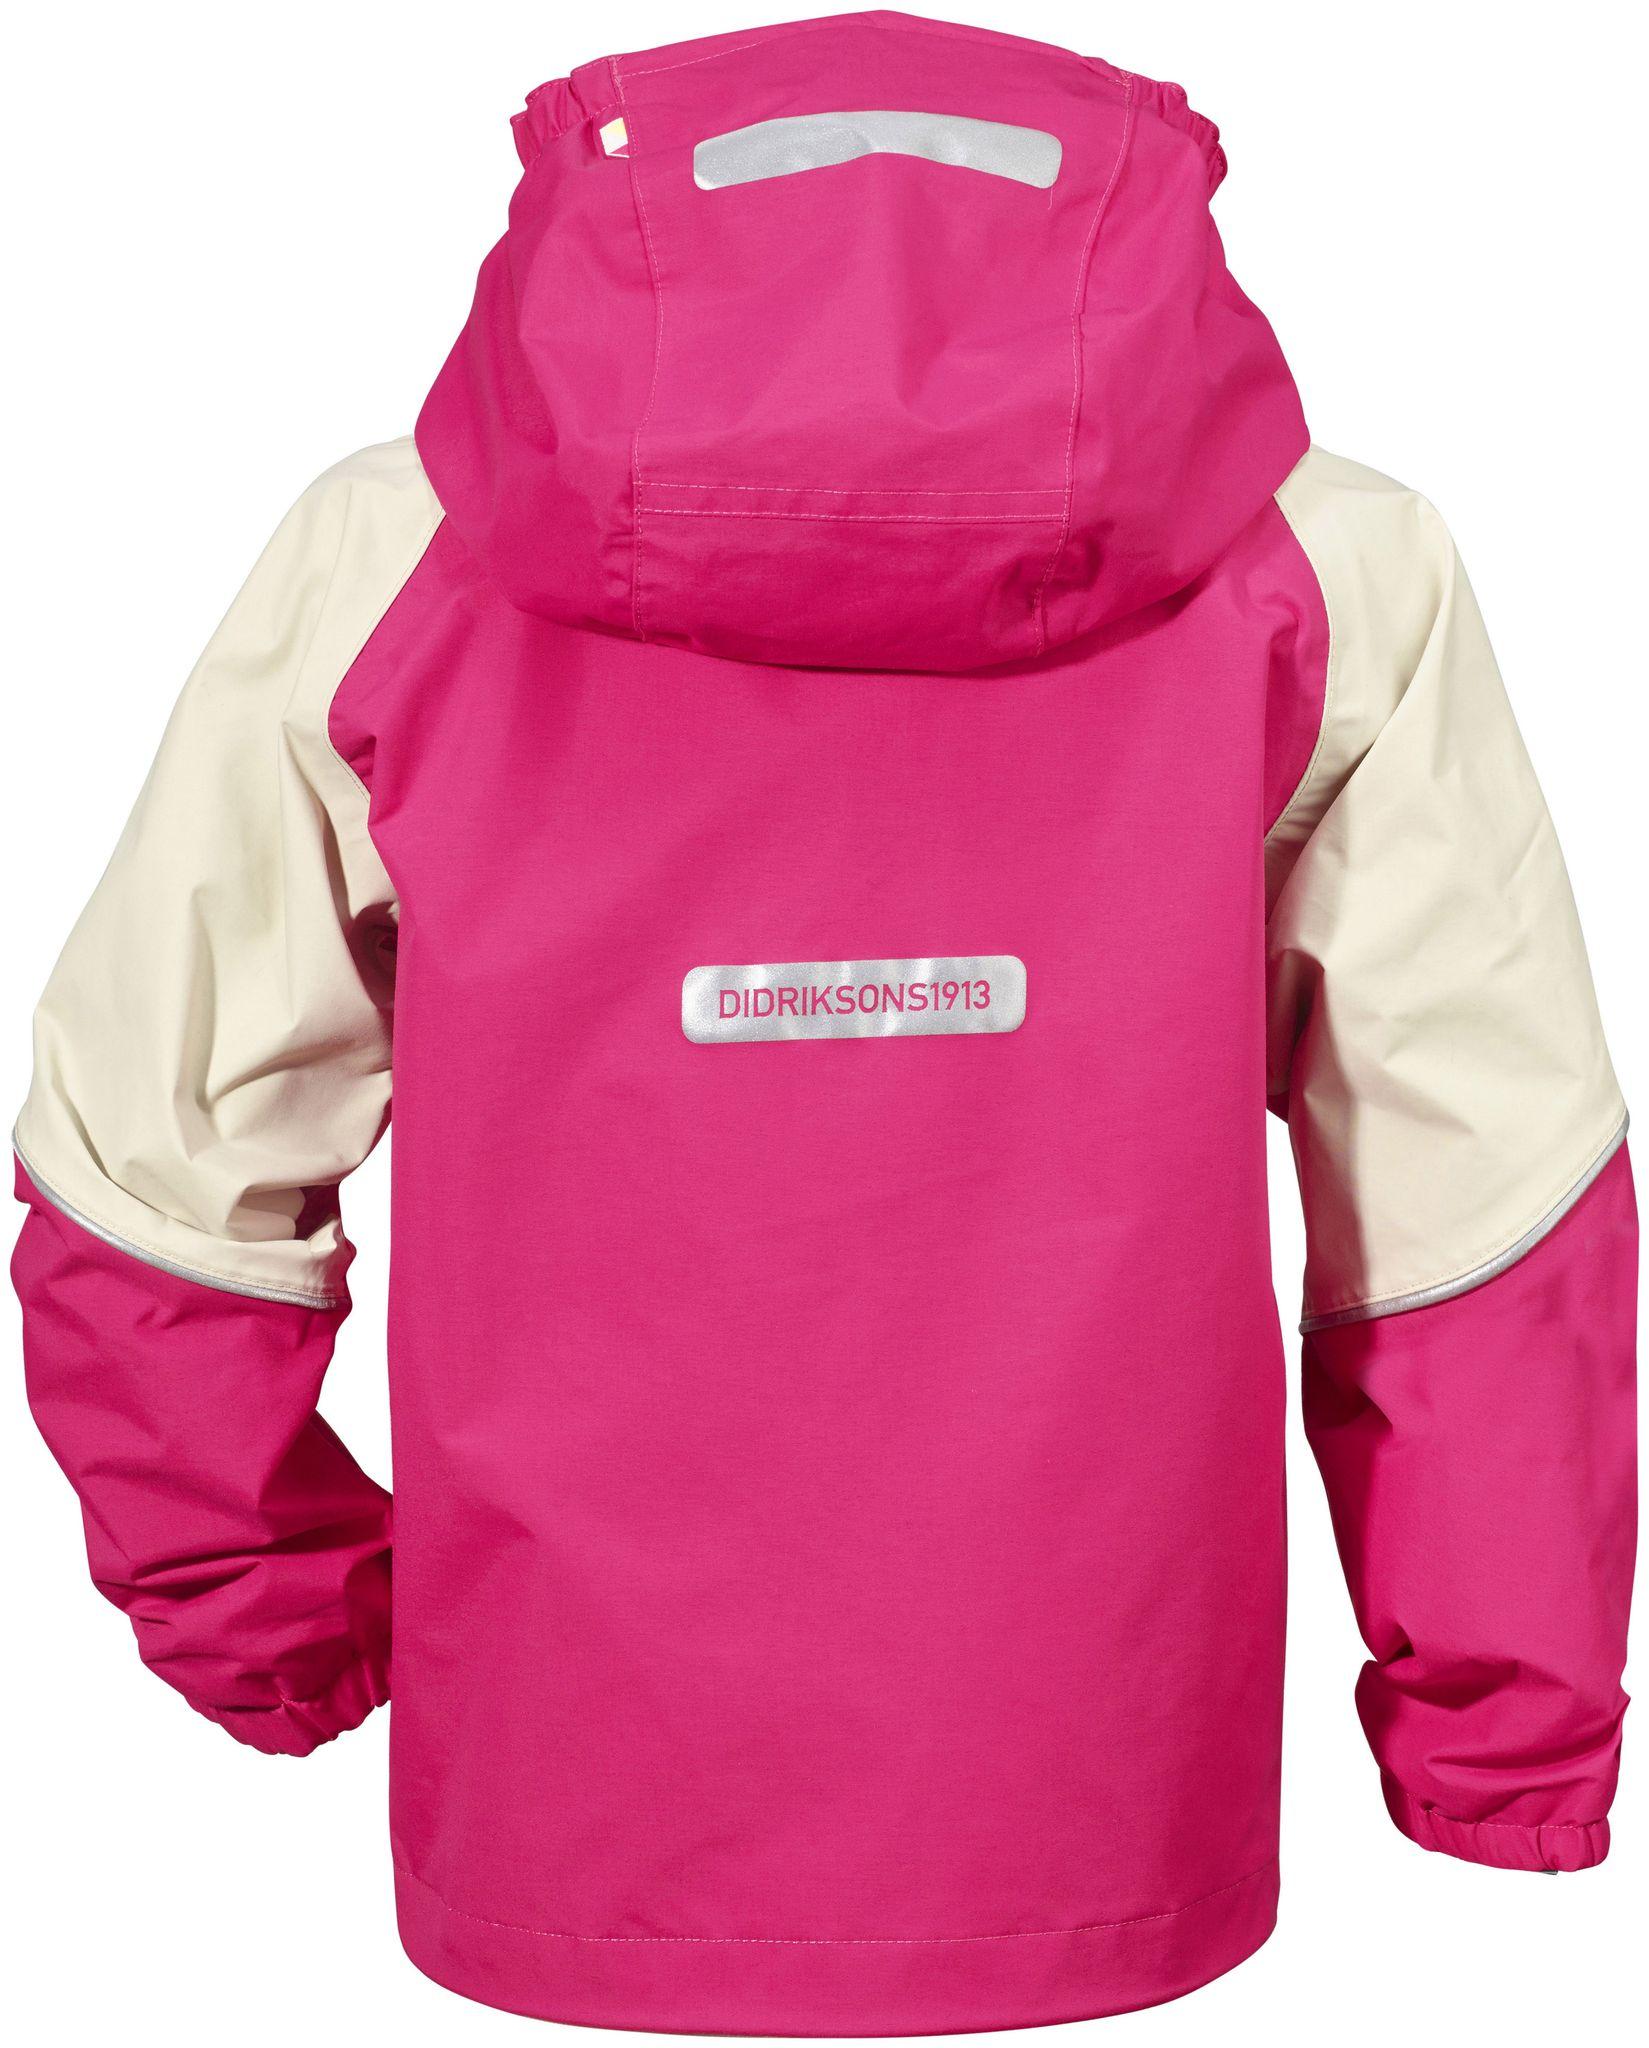 jarkos kid's jacket, fuchsia, 100, didriksons regnkläder